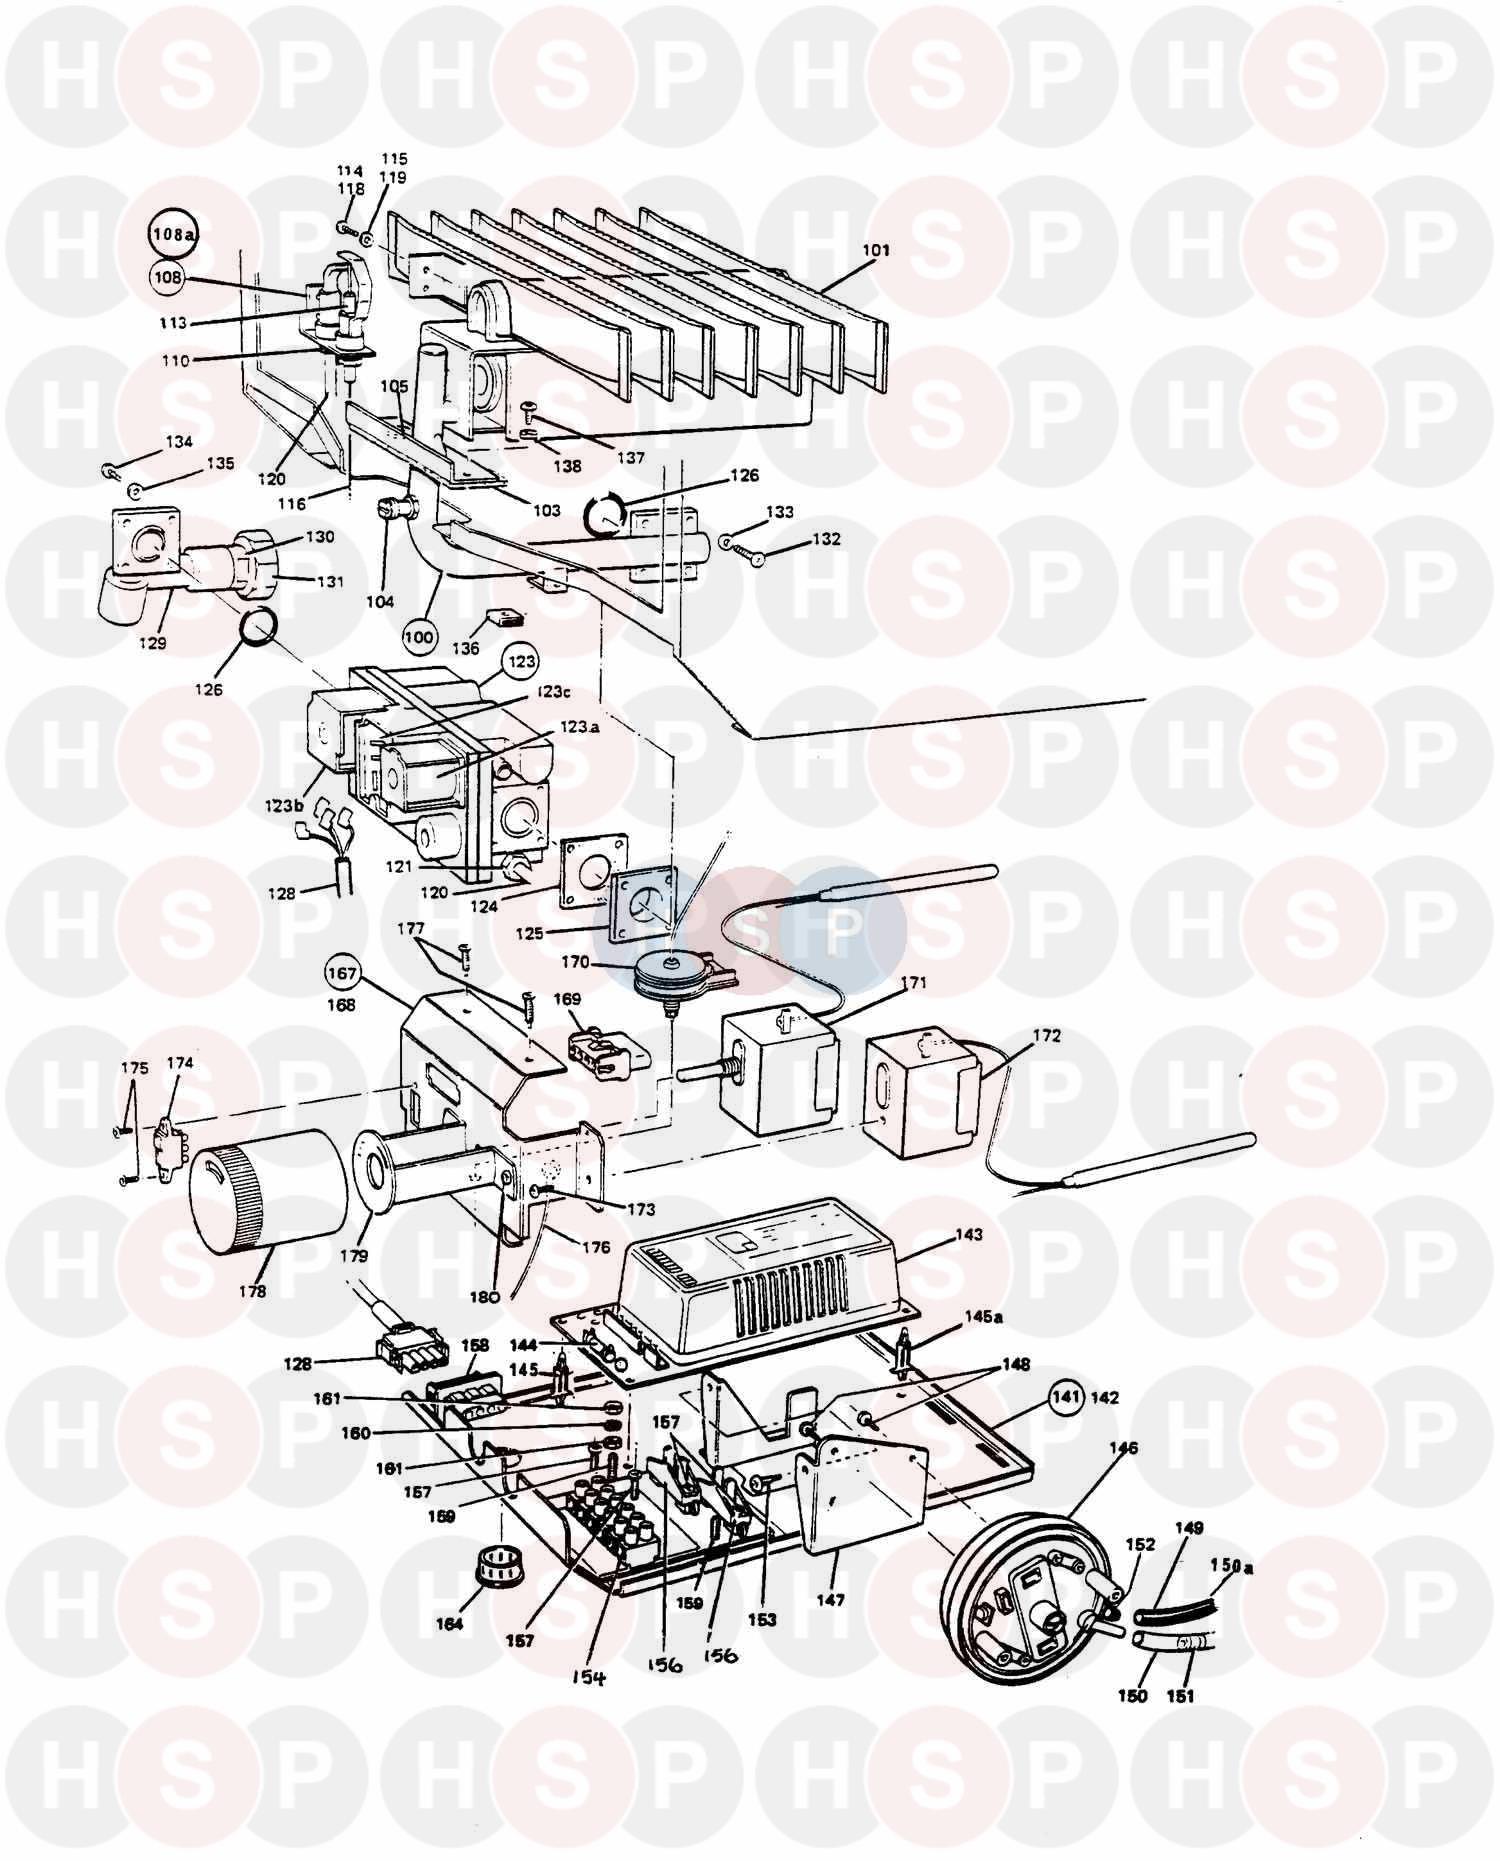 potterton netaheat profile 50e appliance diagram  controls